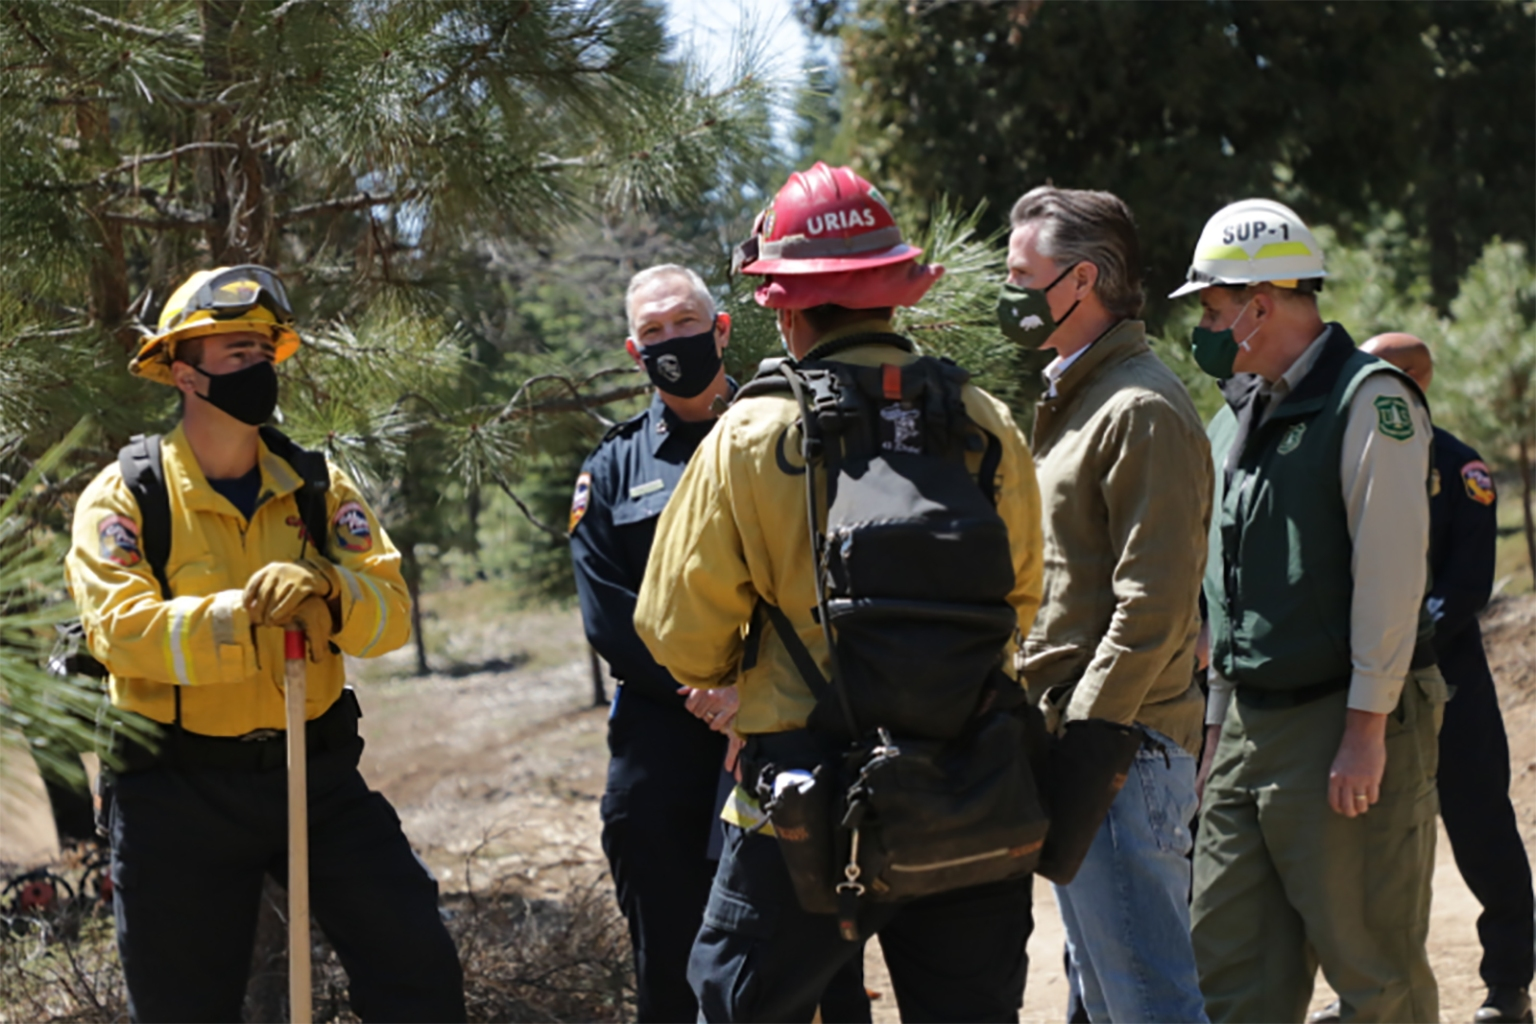 Cal Fire Suspends Burn Permits in Riverside County